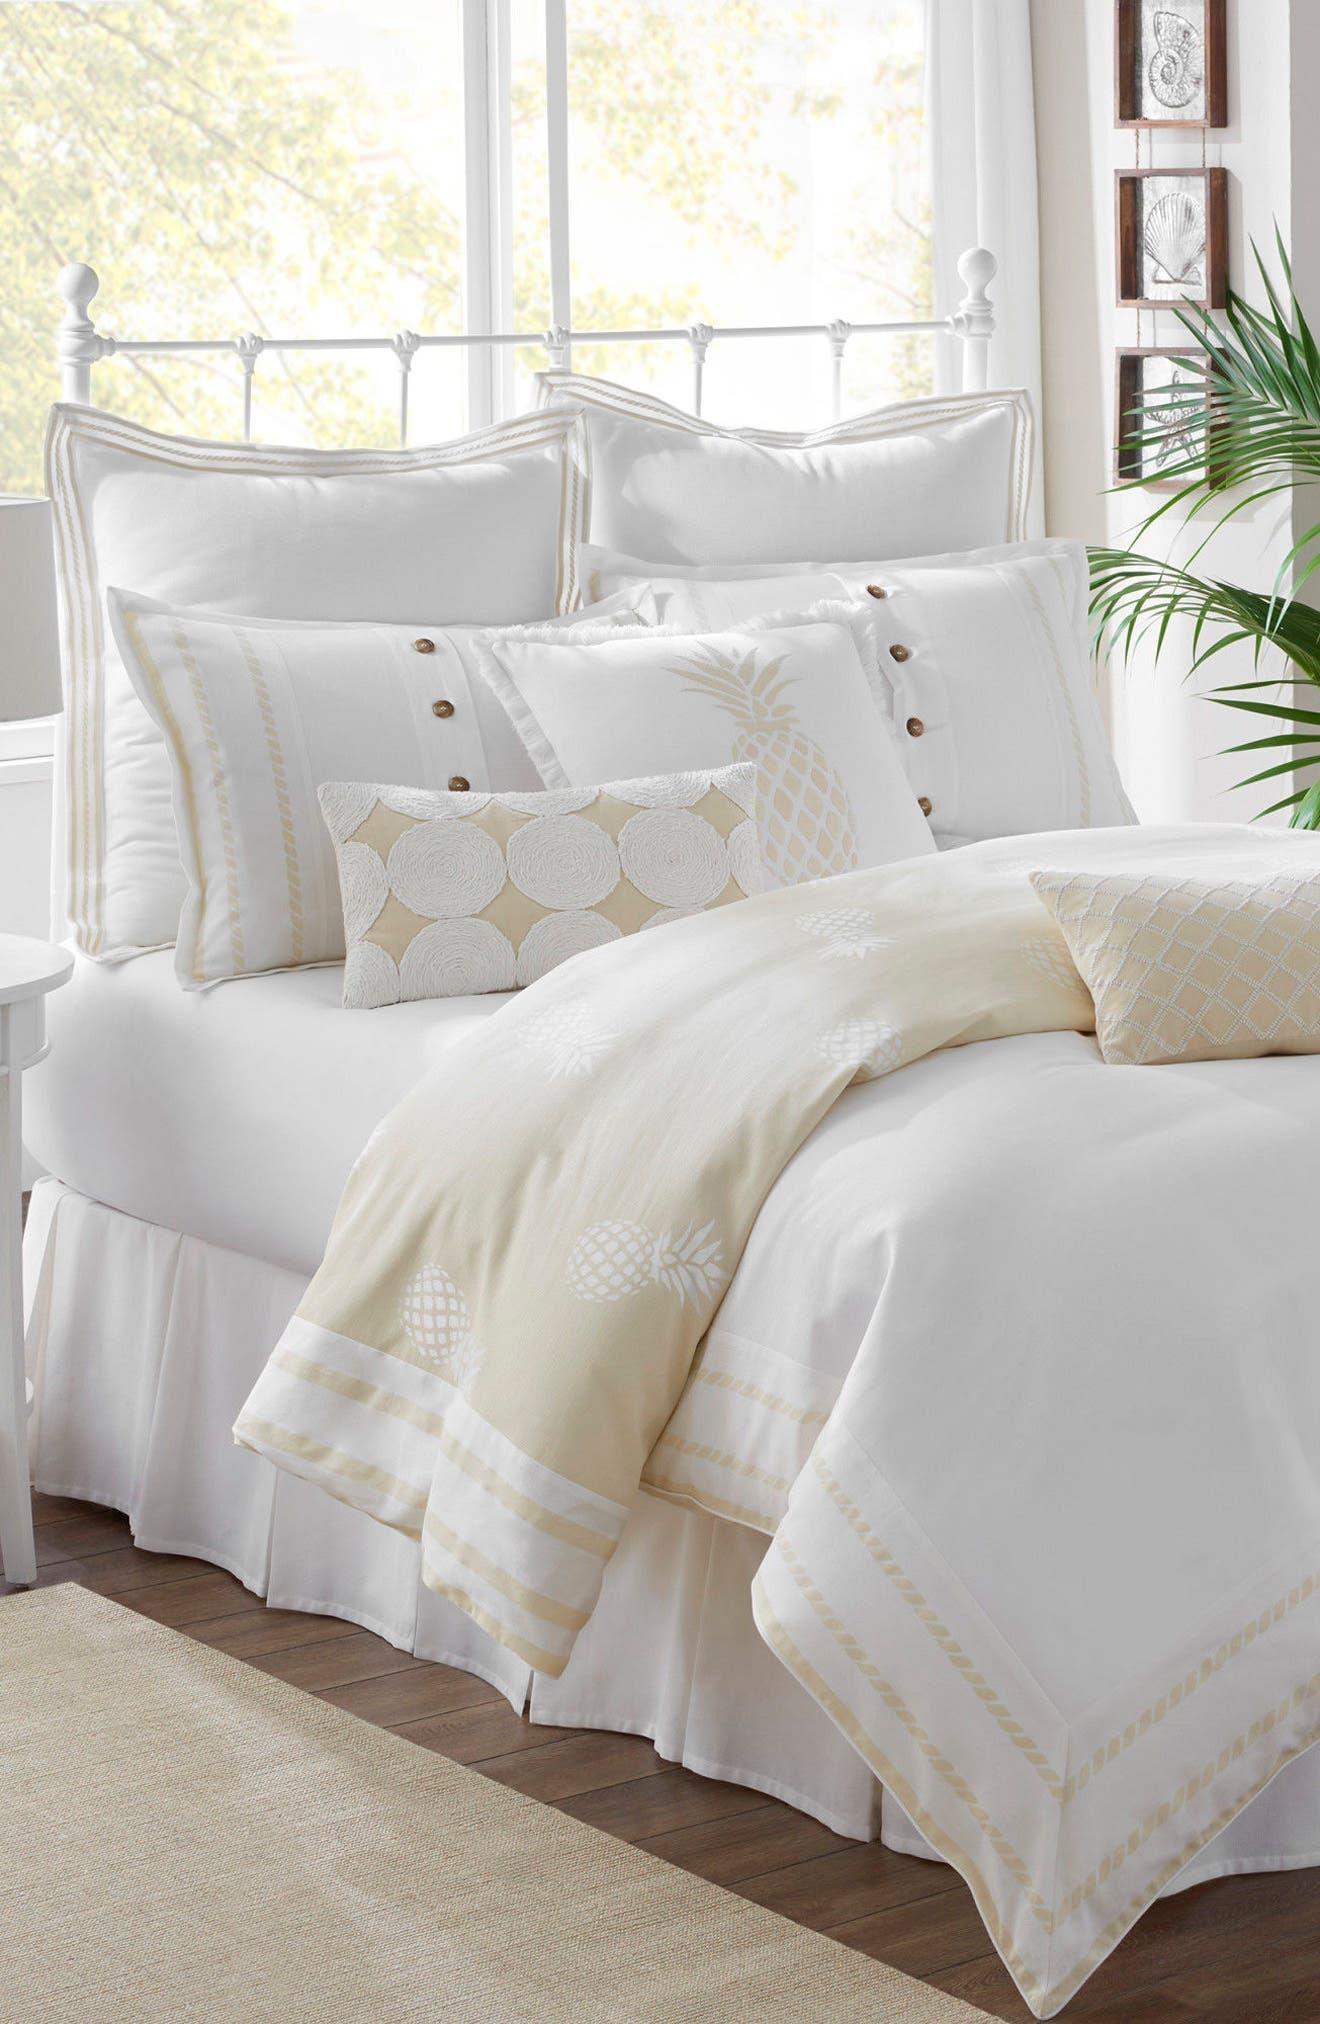 Main Image - Southern Tide Southern Hospitality Comforter, Sham & Bed Skirt Set